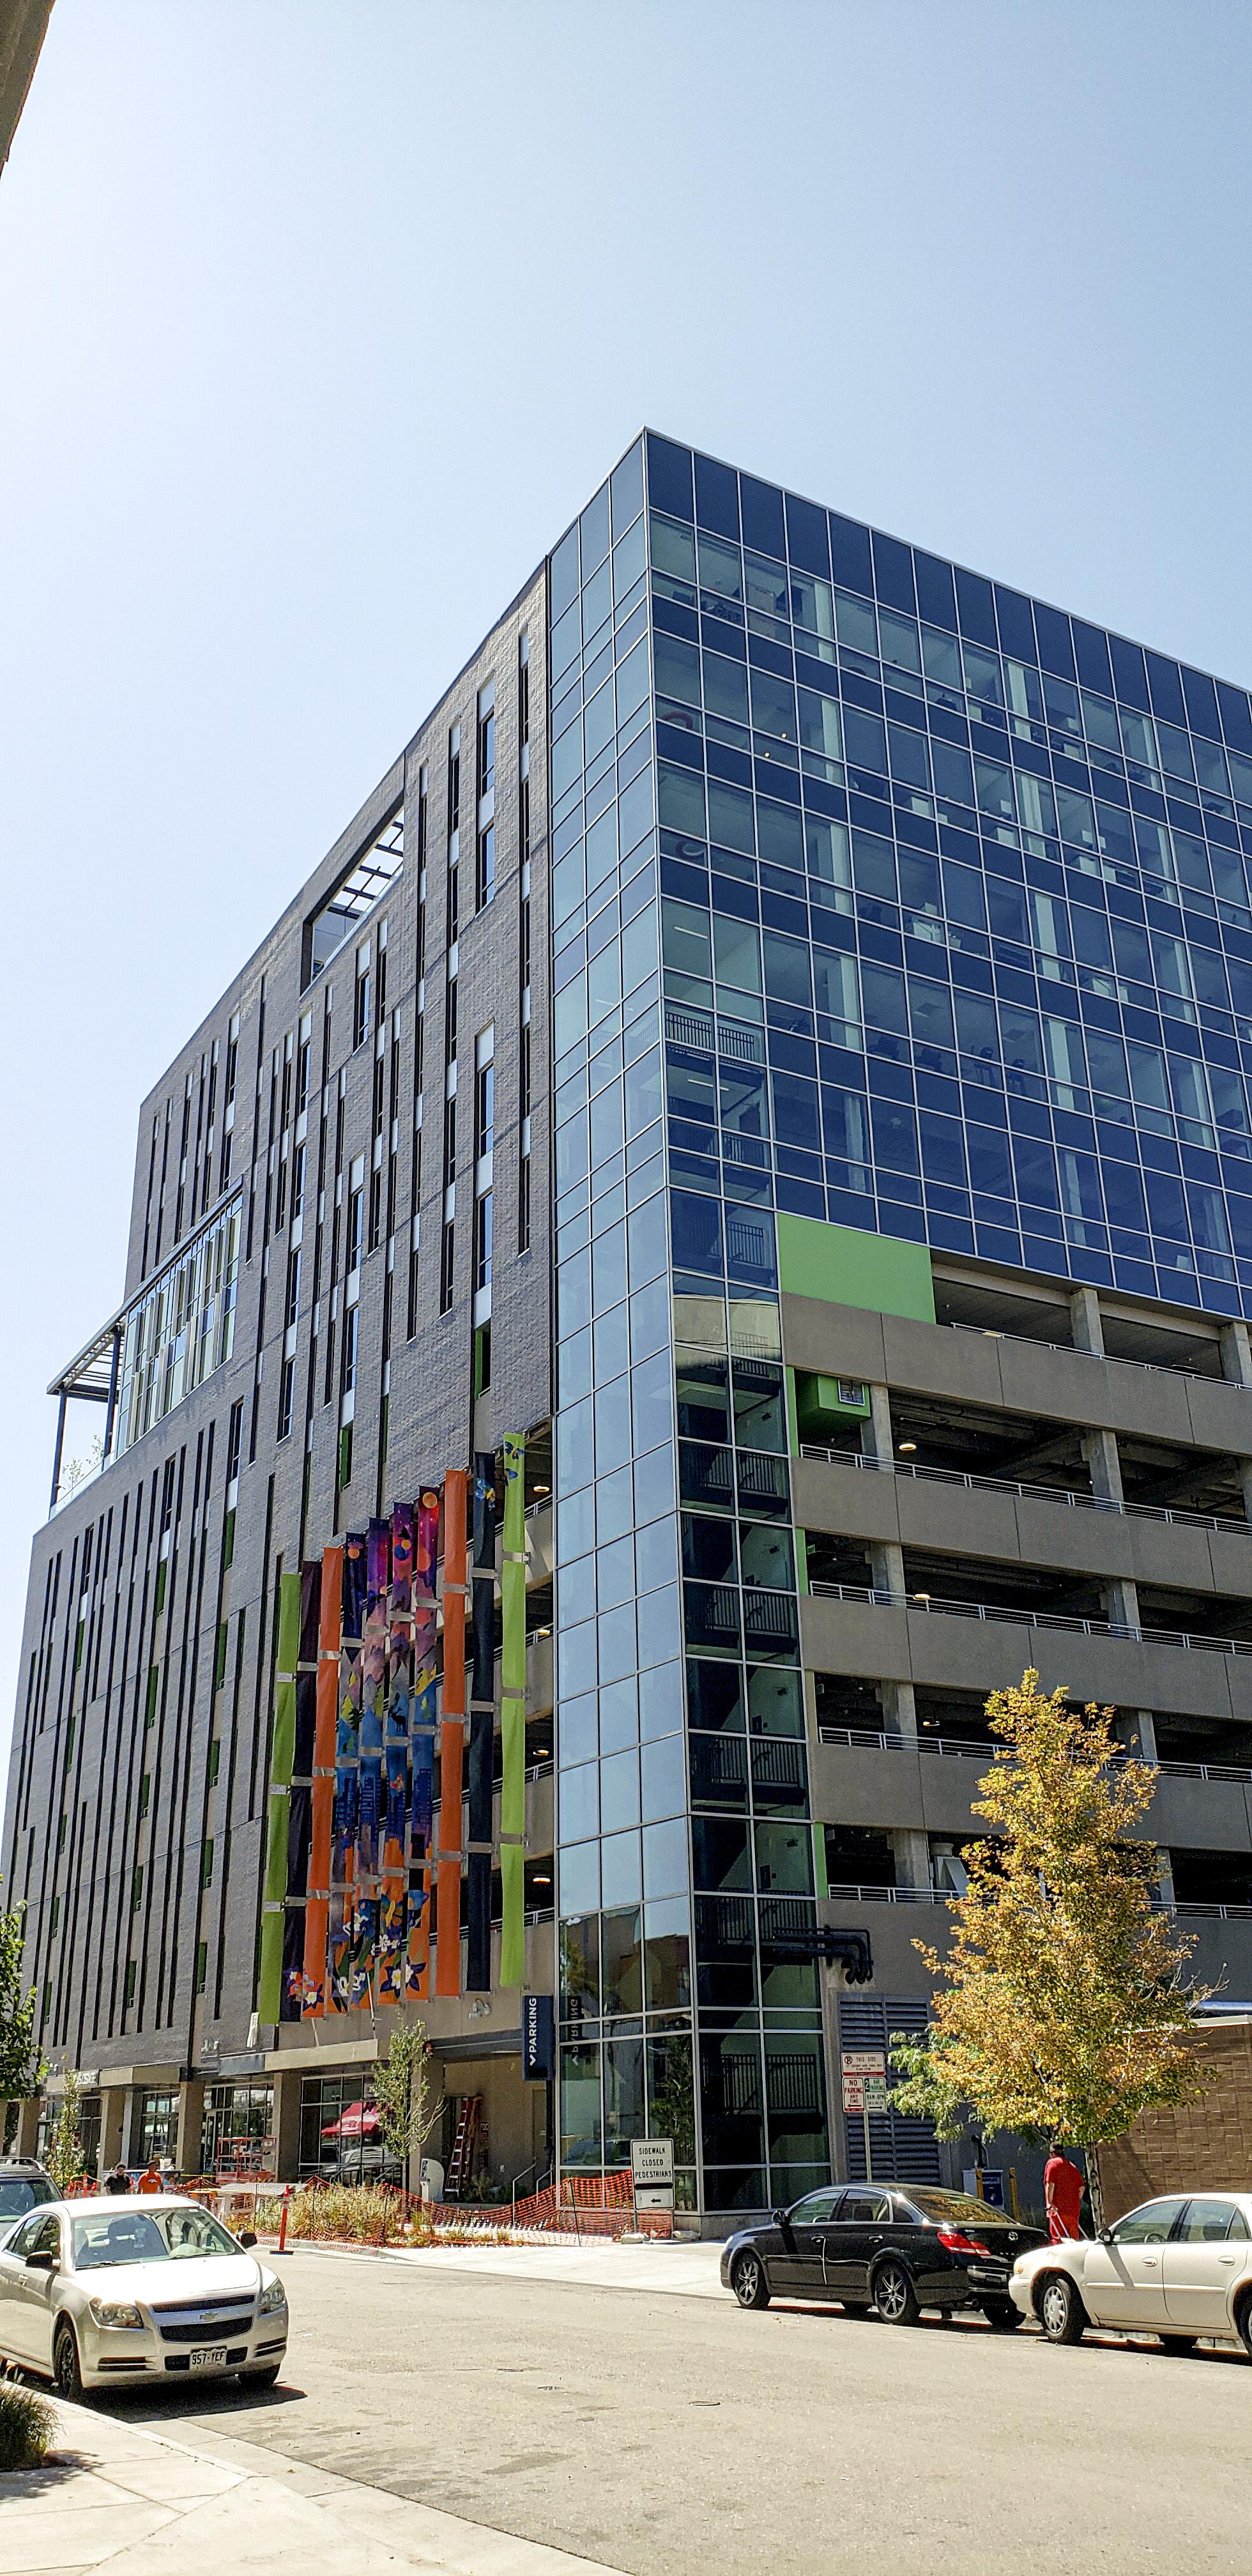 Denver Housing Authority